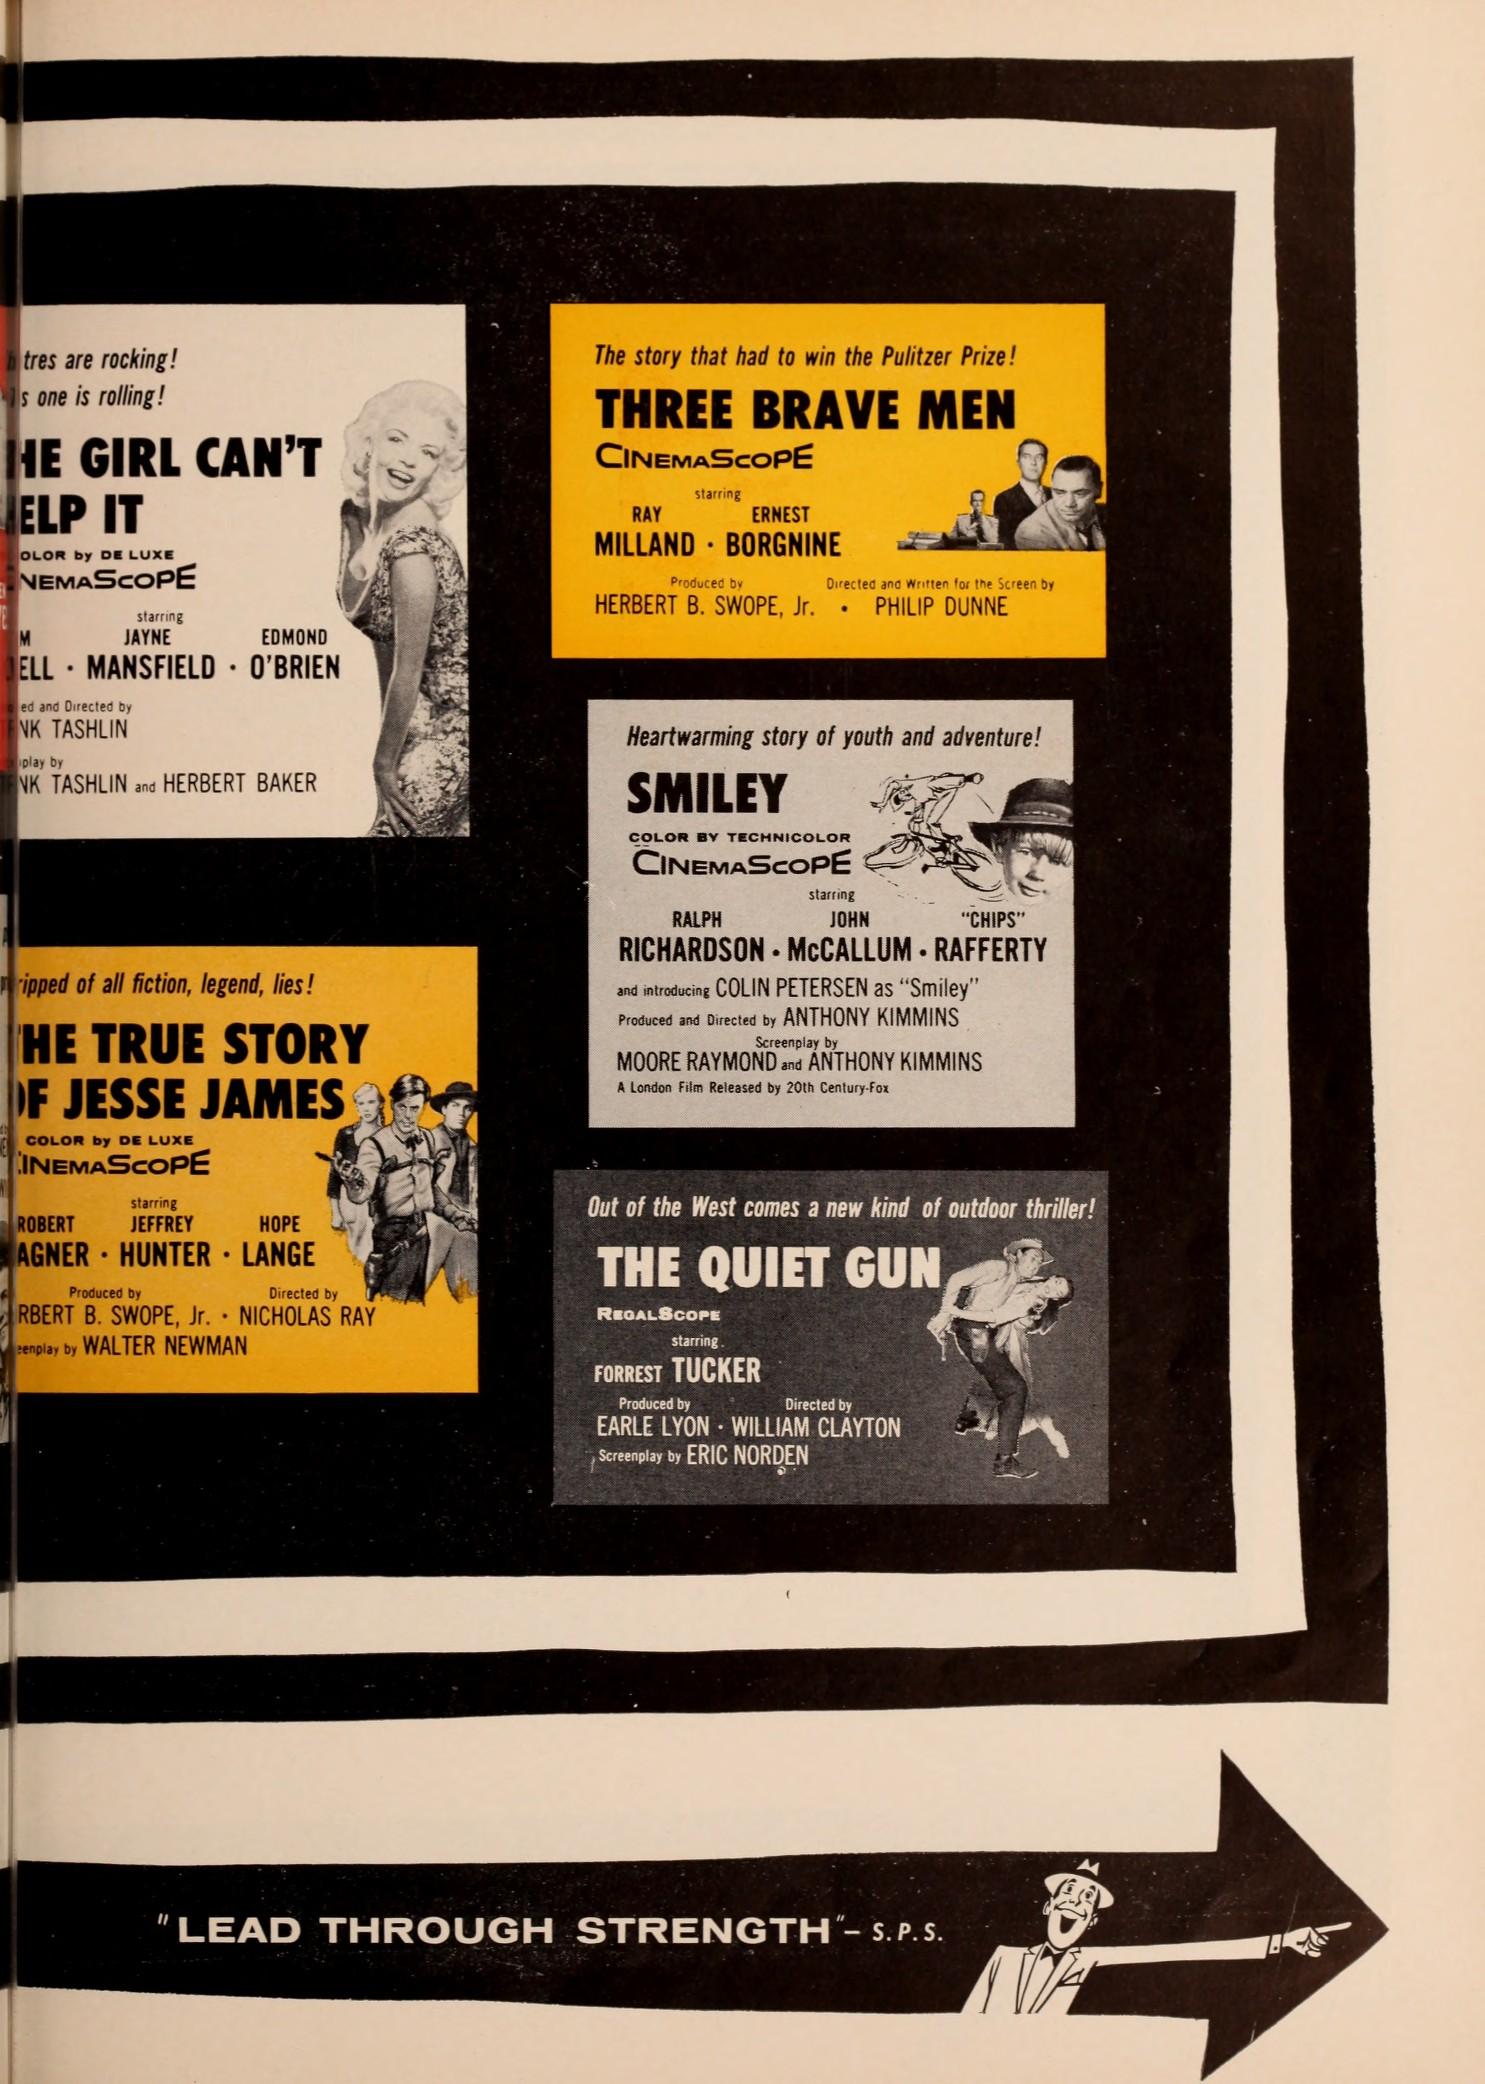 Filmbulletin195725film_jp2.zip&file=filmbulletin195725film_jp2%2ffilmbulletin195725film_0063